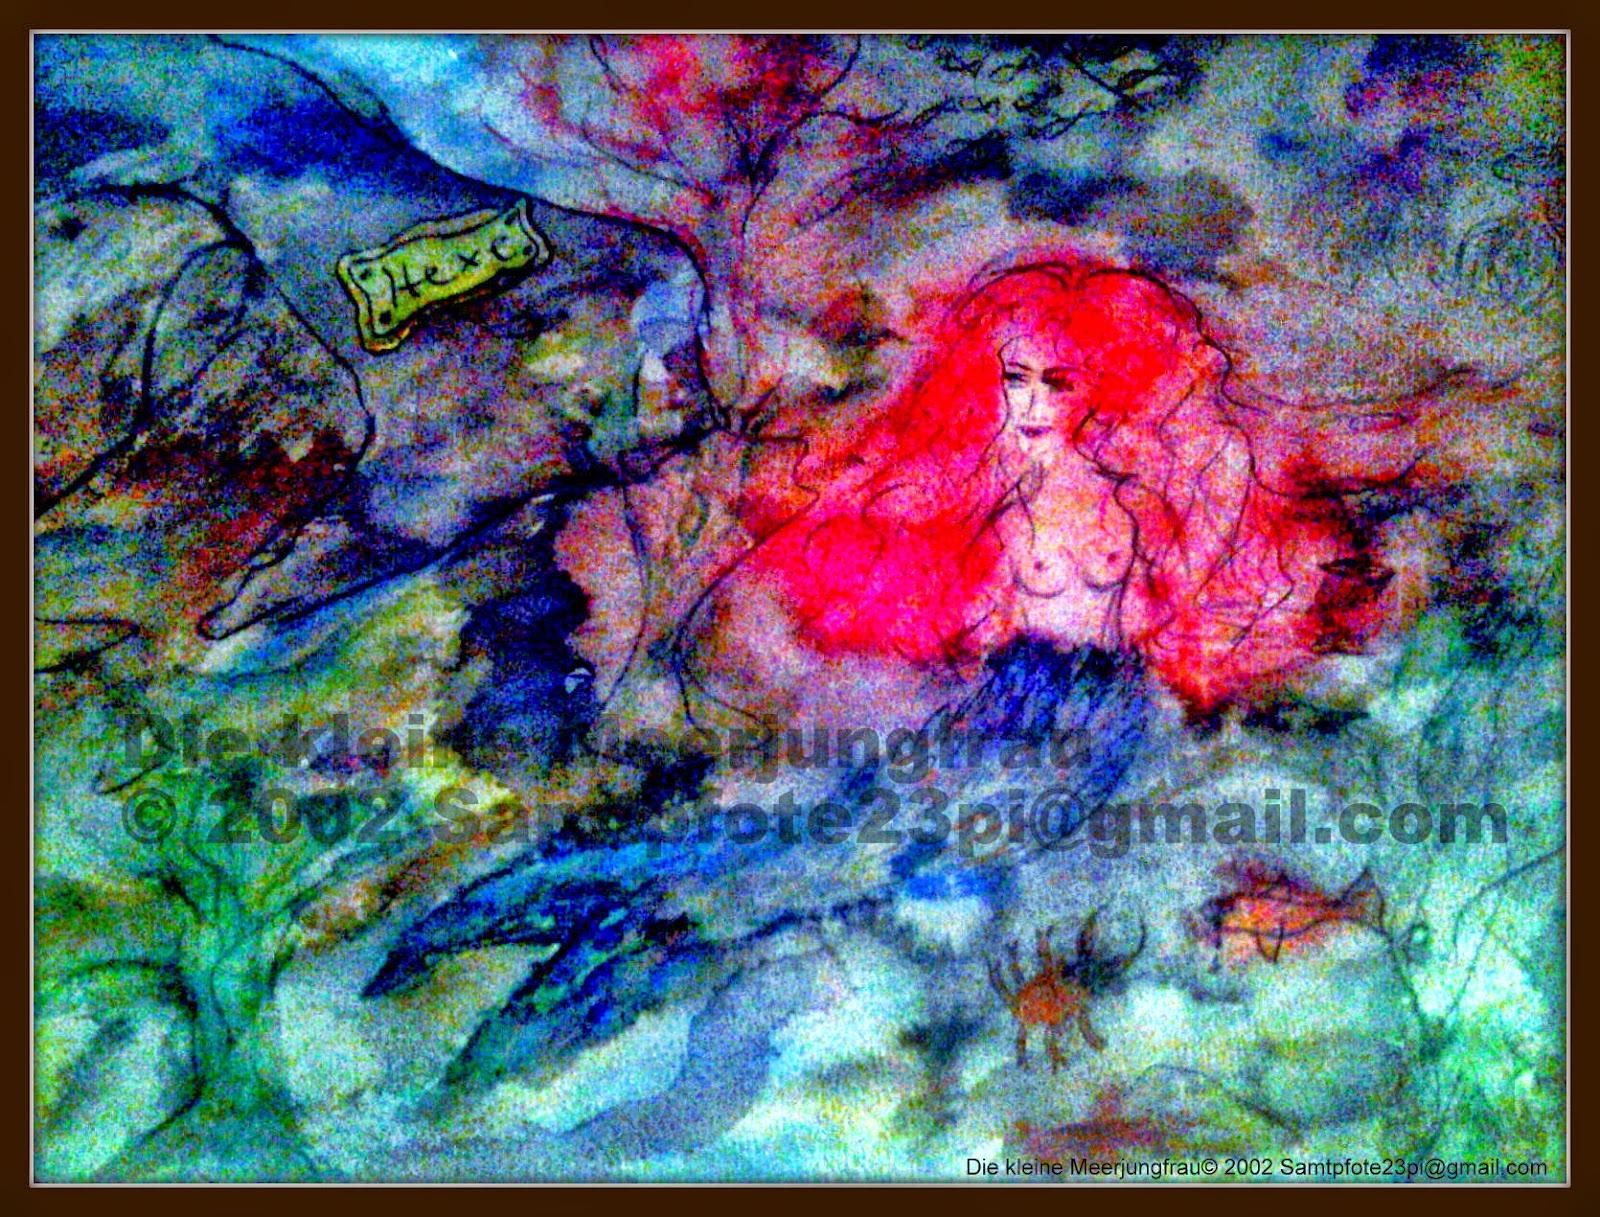 Die kleine Meerjungfrau, Aquarell auf Papier, © 2002 Samtpfote23pi@gmail.com